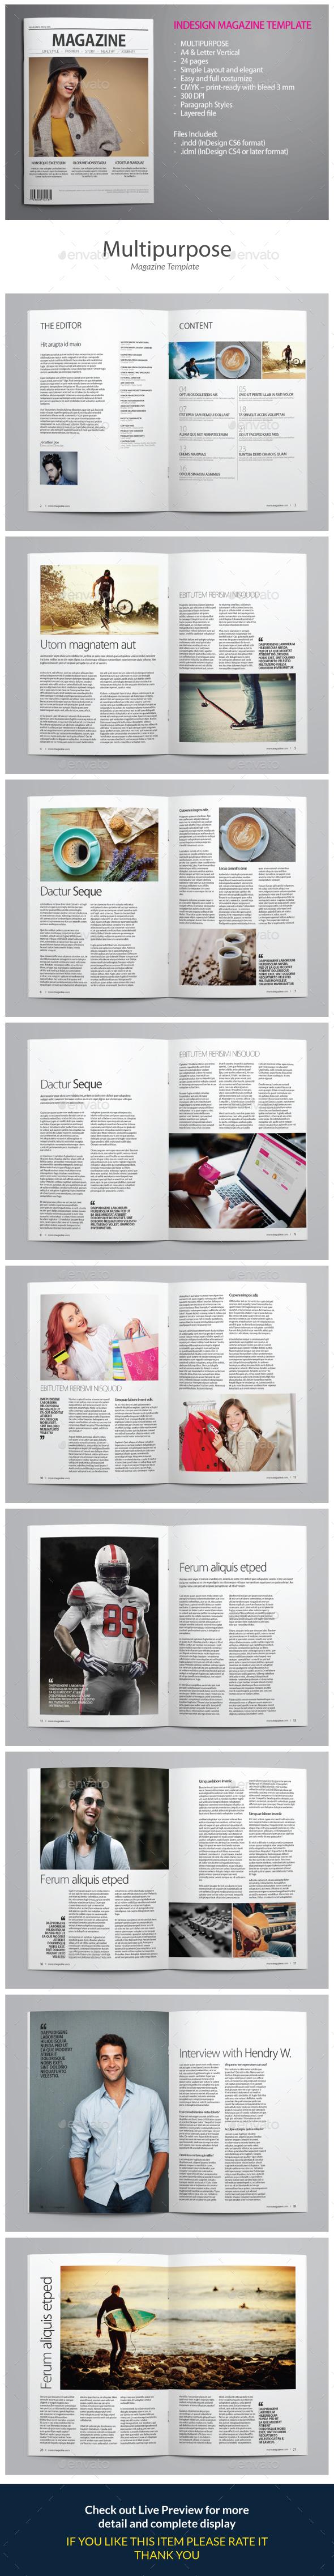 Indesign Magazine Template vol 5 - Magazines Print Templates